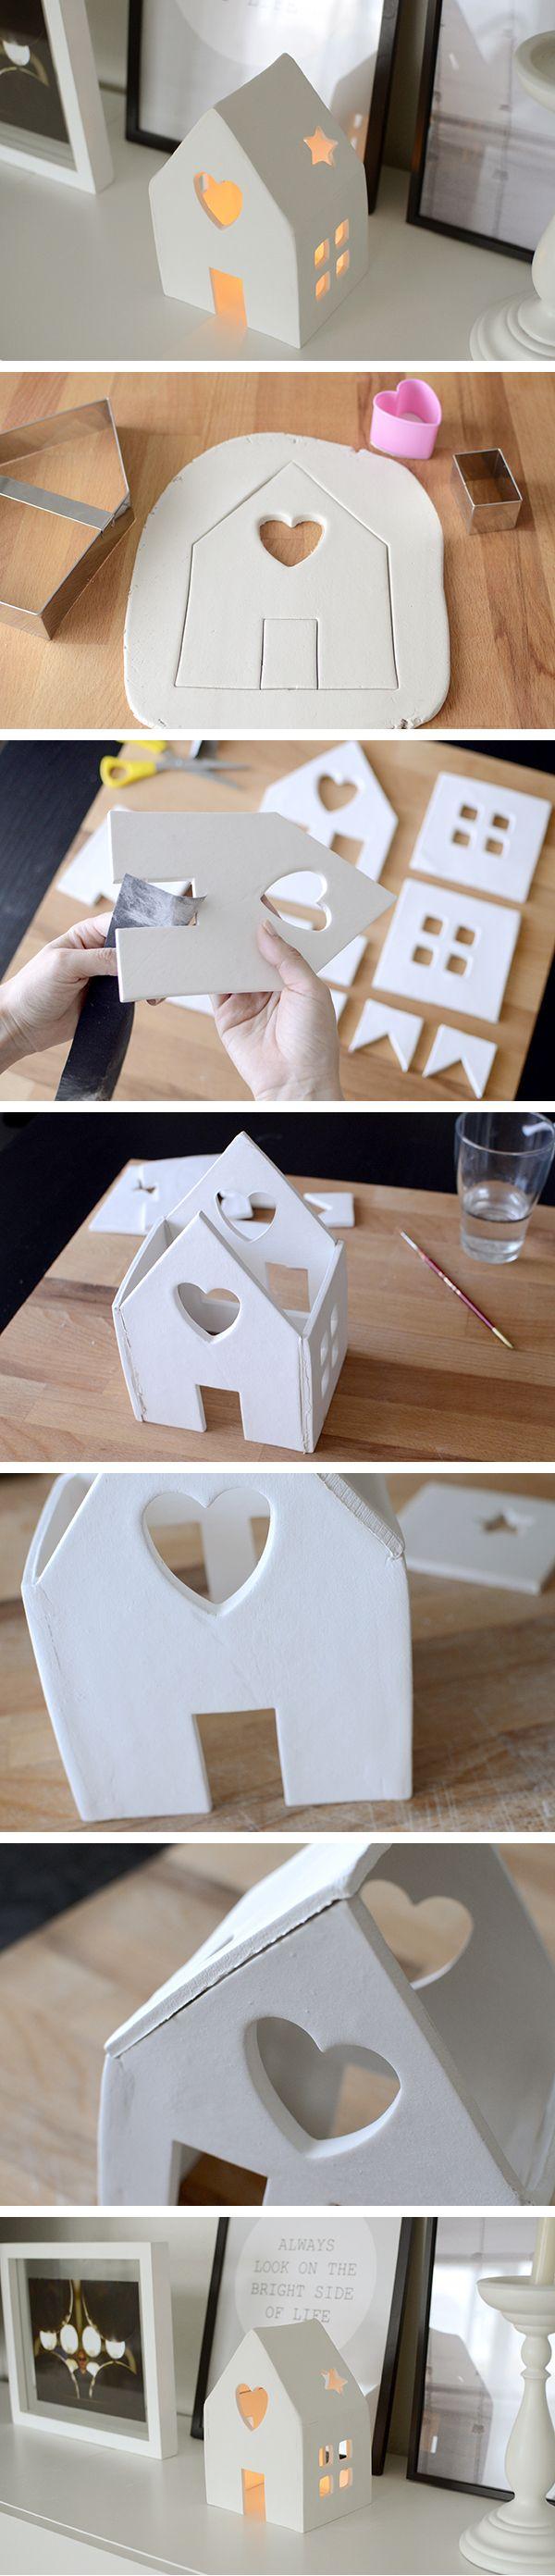 Diy house candleholder with air dry clay diy casita portavelas